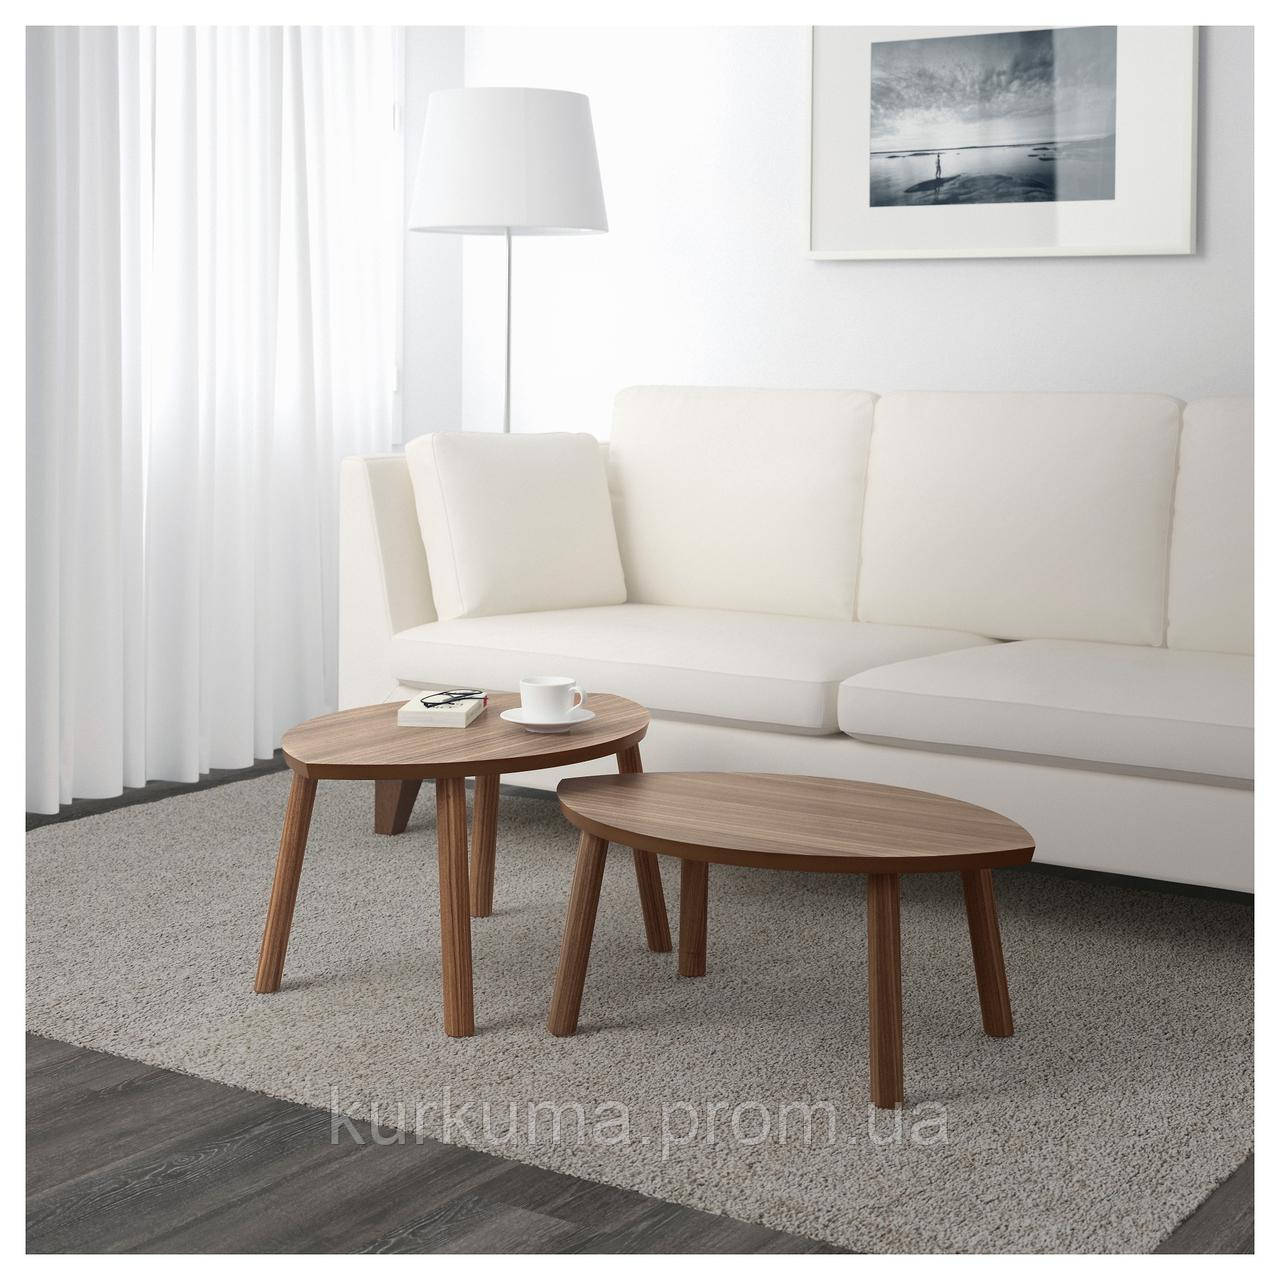 IKEA STOCKHOLM Стол 2 шт., шпон грецкого ореха  (102.397.13)